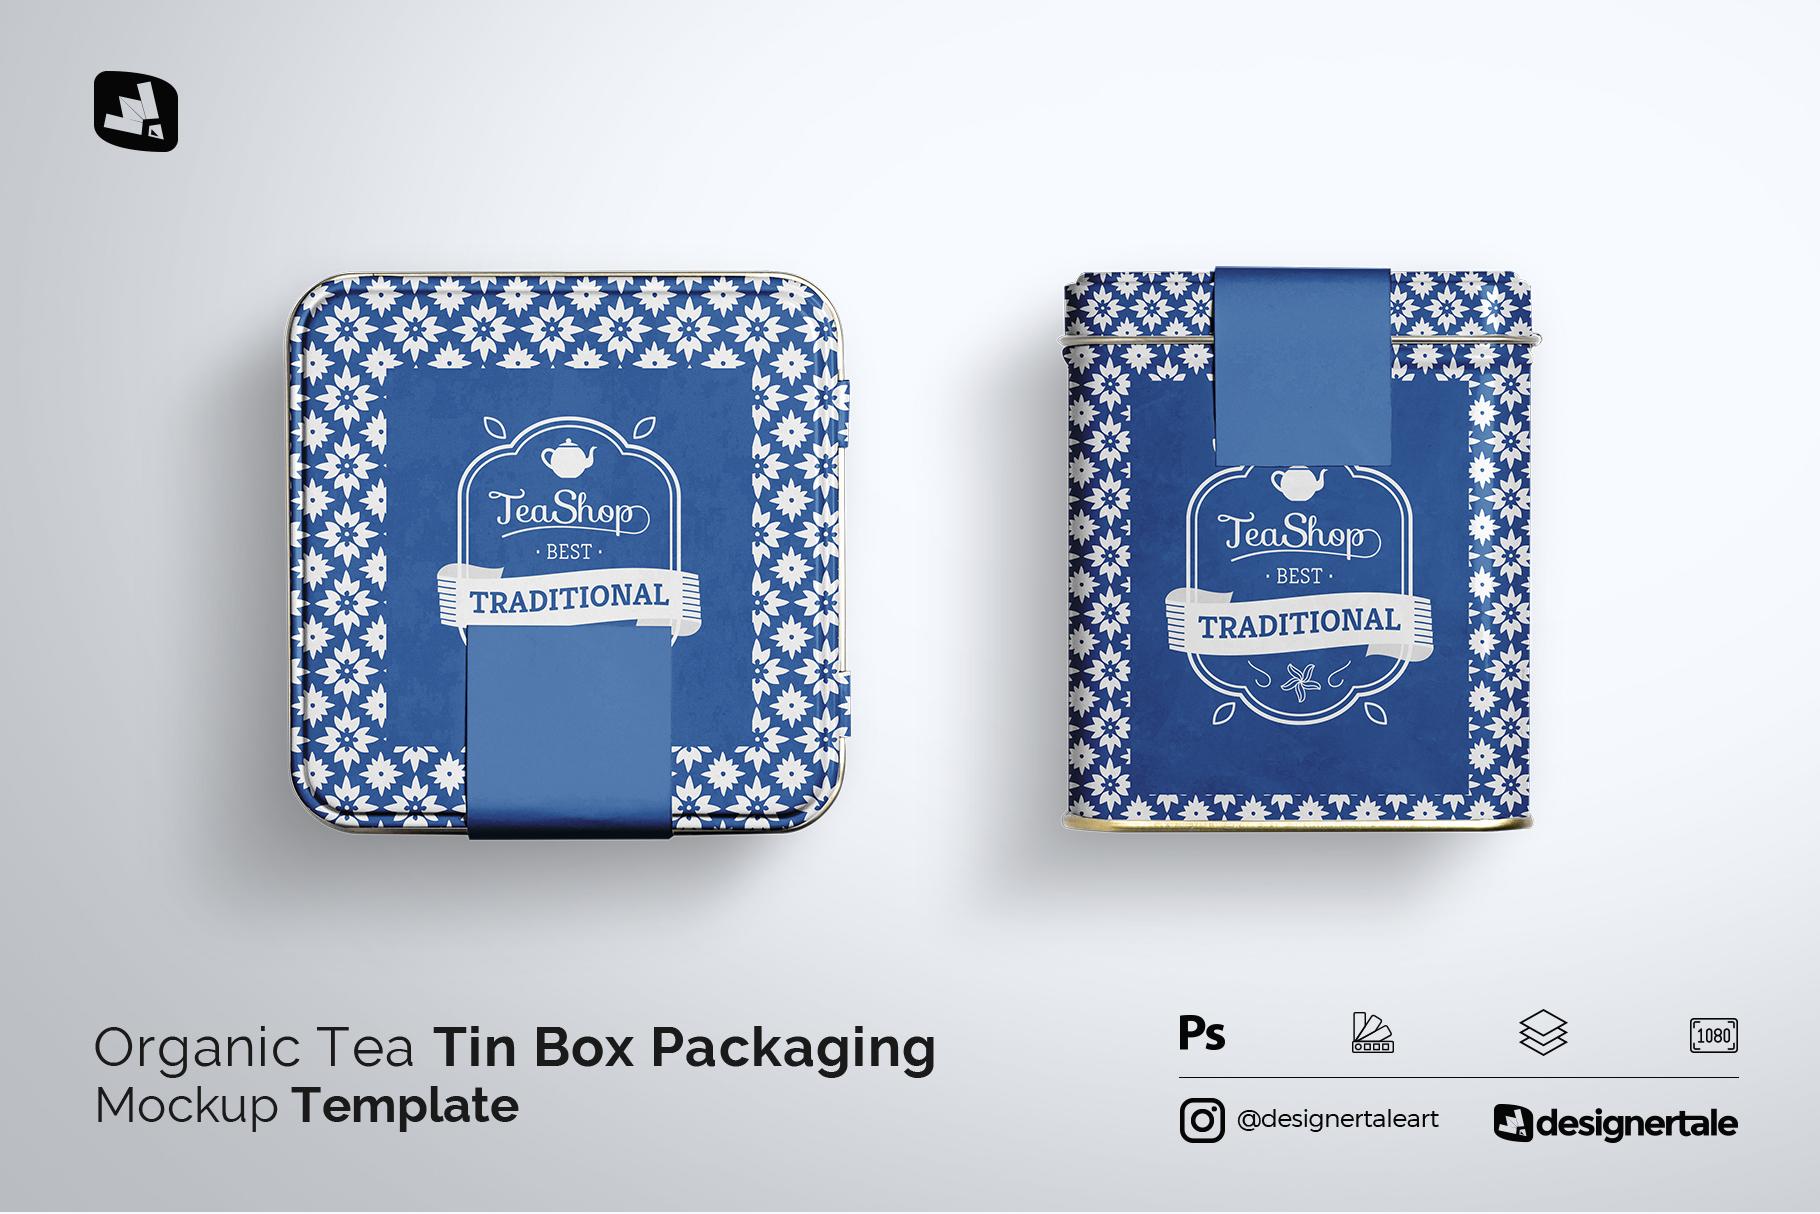 organic tea tin box packaging mockup